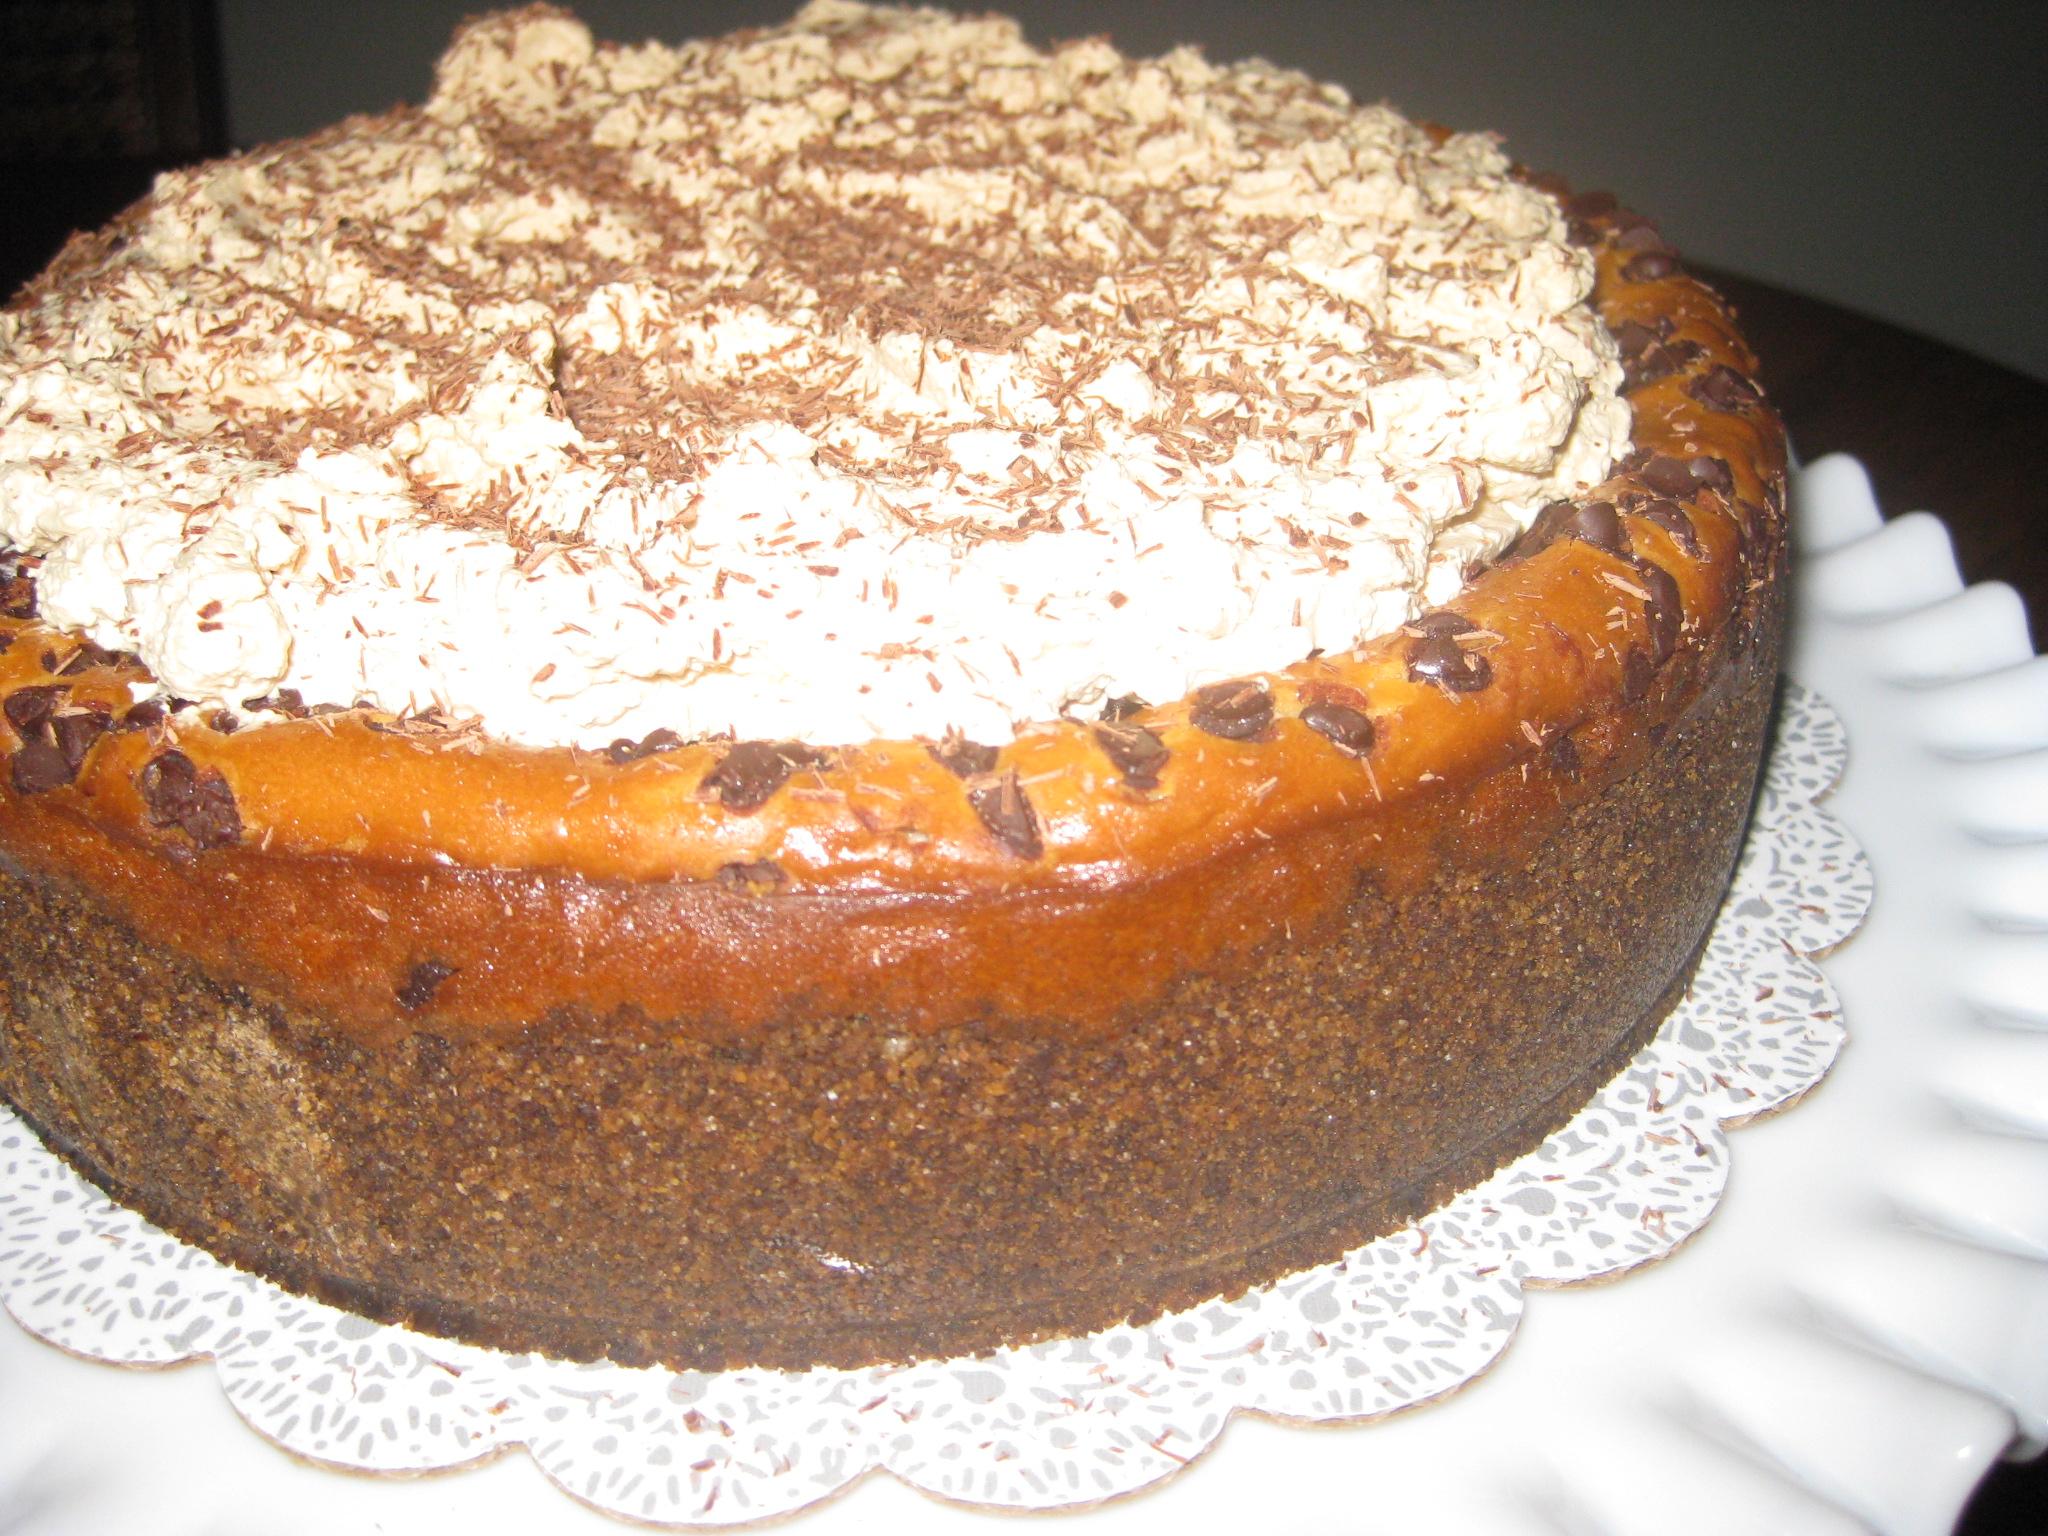 Coffee Liquor Chocolate Cheesecake Recipes — Dishmaps